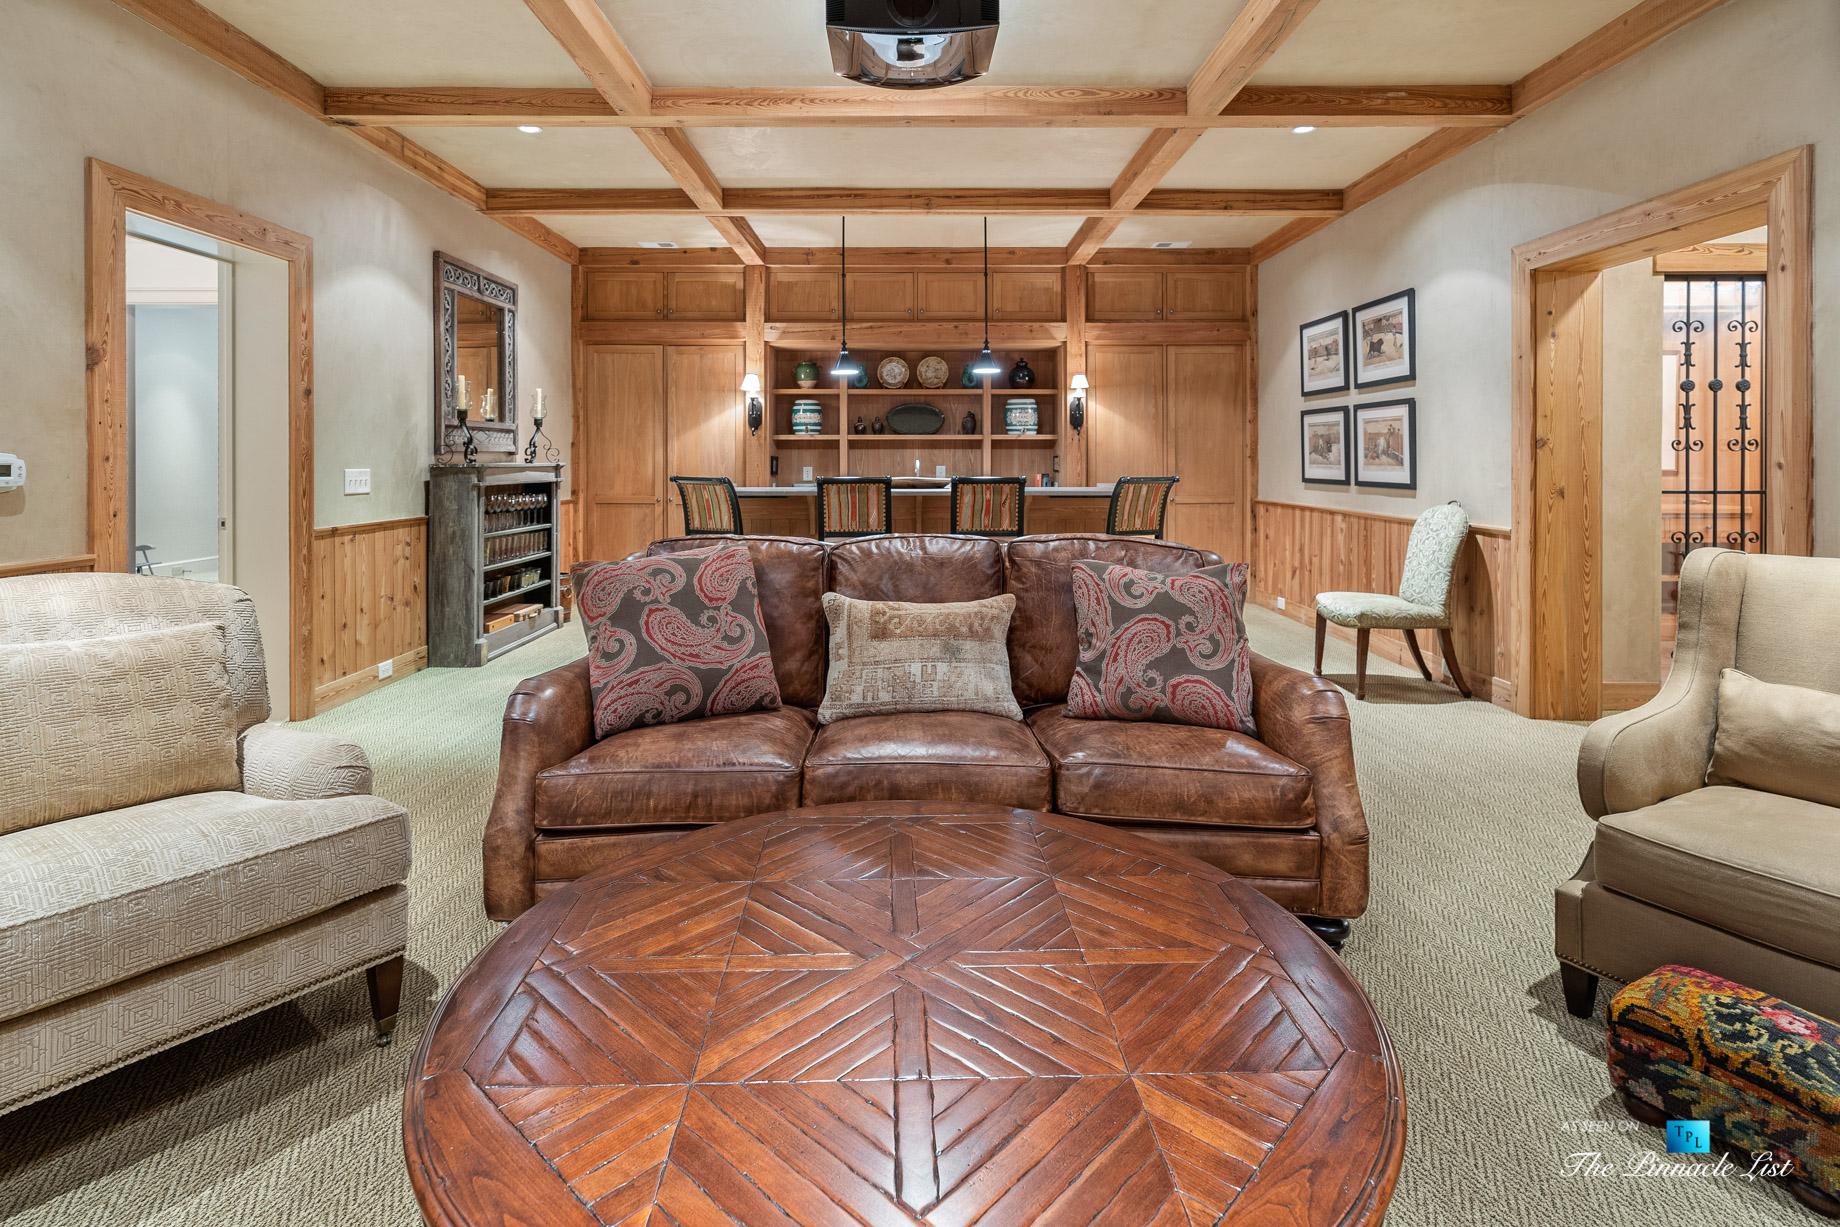 439 Blackland Rd NW, Atlanta, GA, USA – Theatre Room – Luxury Real Estate – Tuxedo Park Mediterranean Mansion Home